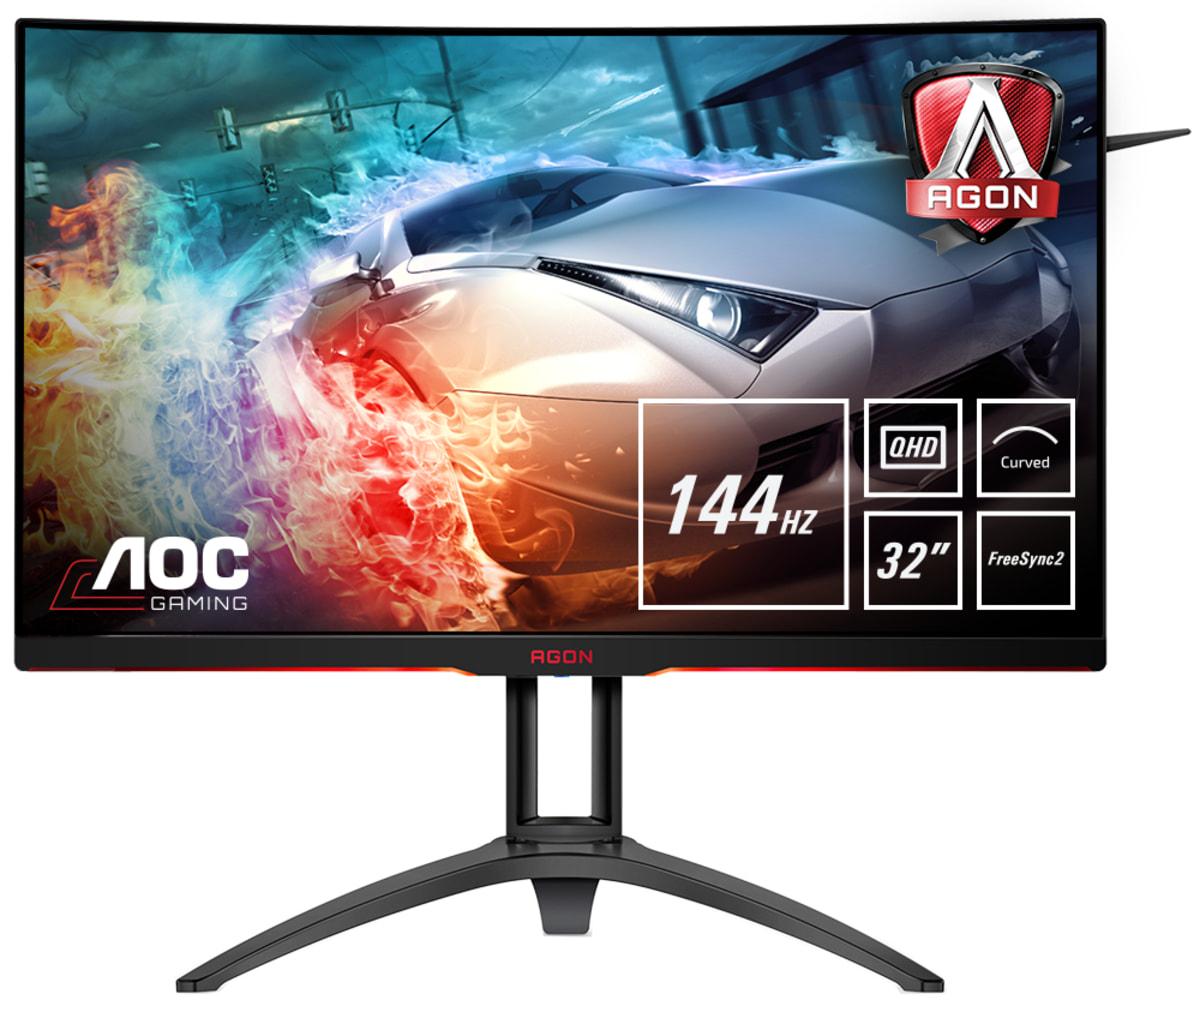 Curved Monitor - Ag322qc4 - 31.5in - 2560x1440 (wqhd) - 4ms